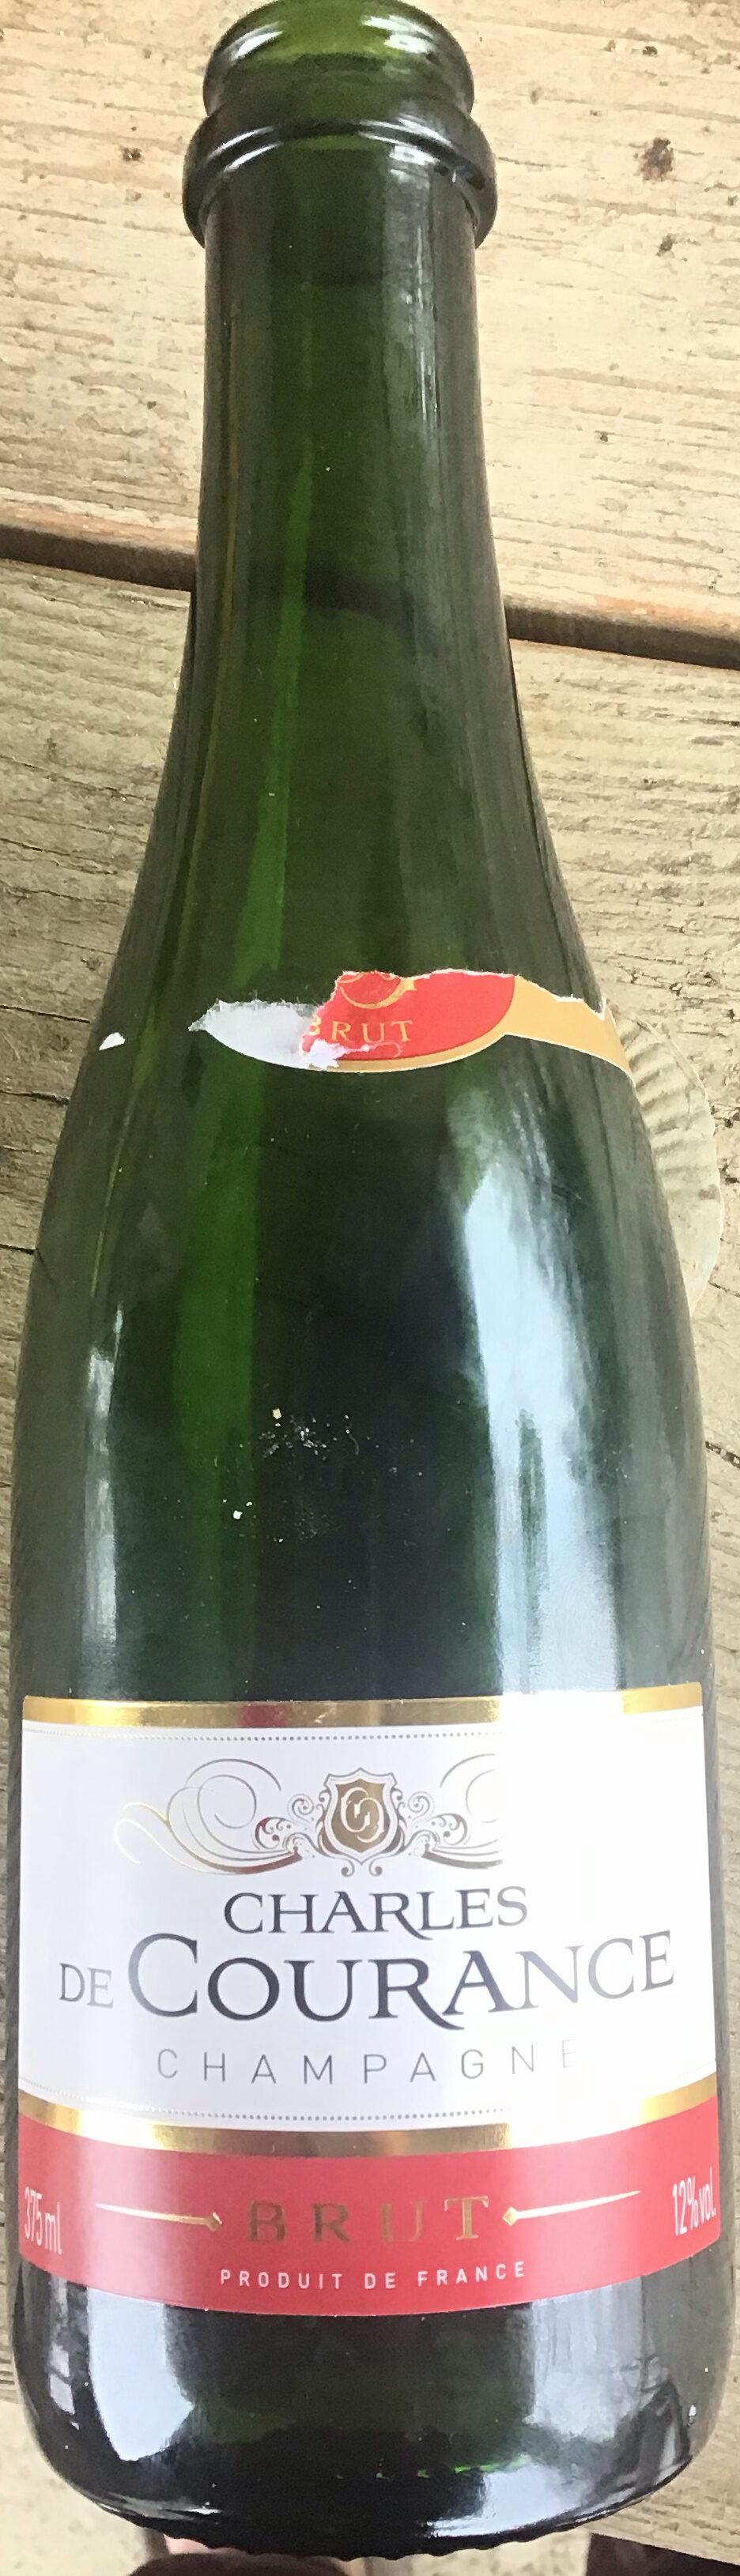 Champagne brut - Product - fr